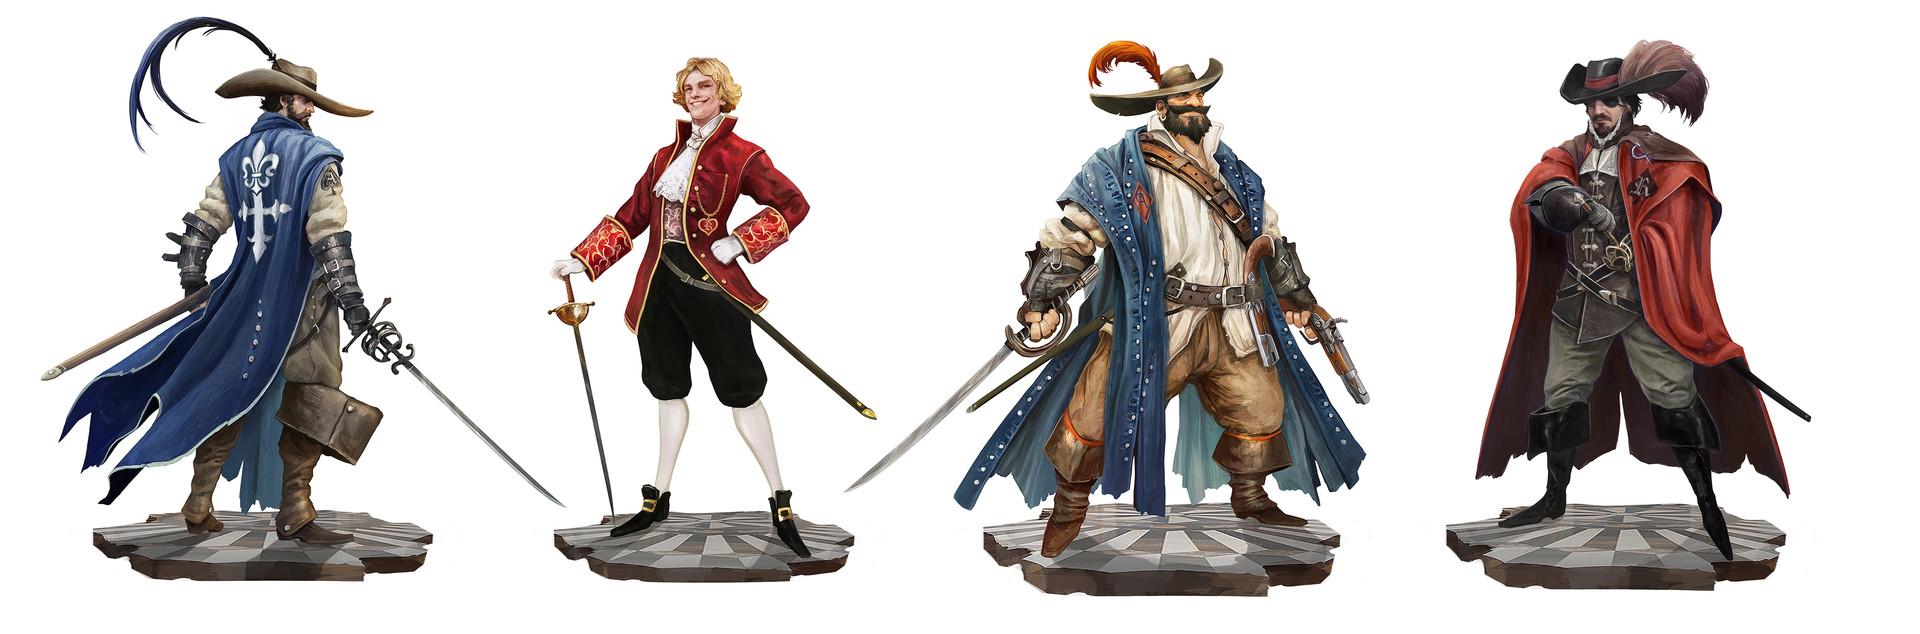 Alexandre chaudret nola characters folio lineup man